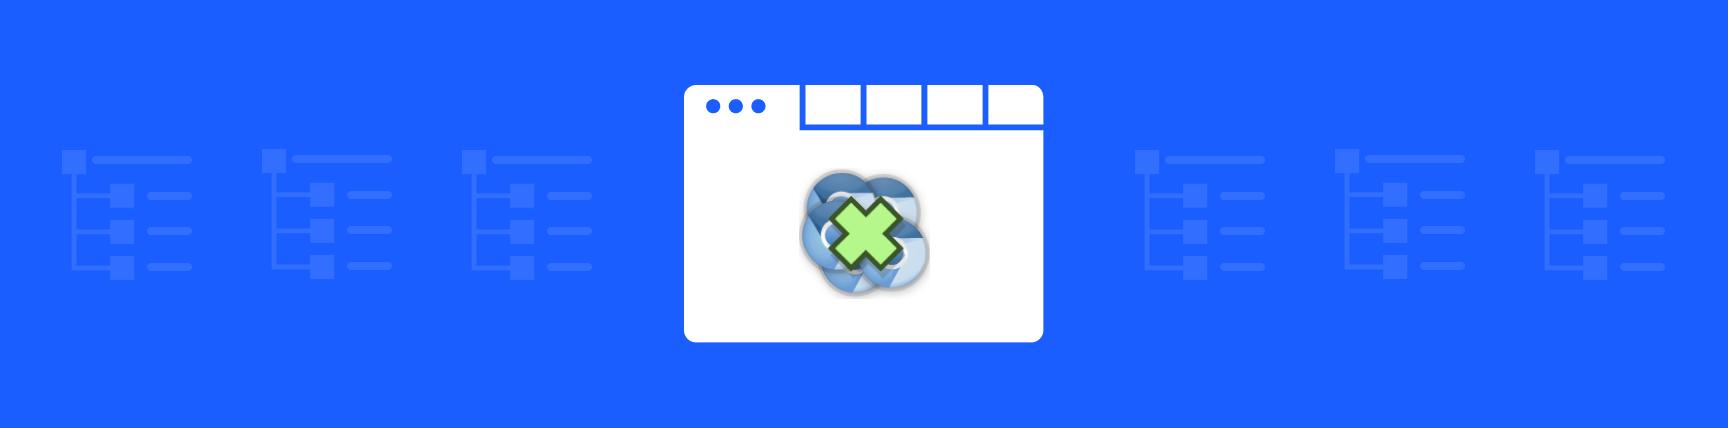 Tabs Outliner logo centered in a browser window, set against a blue background